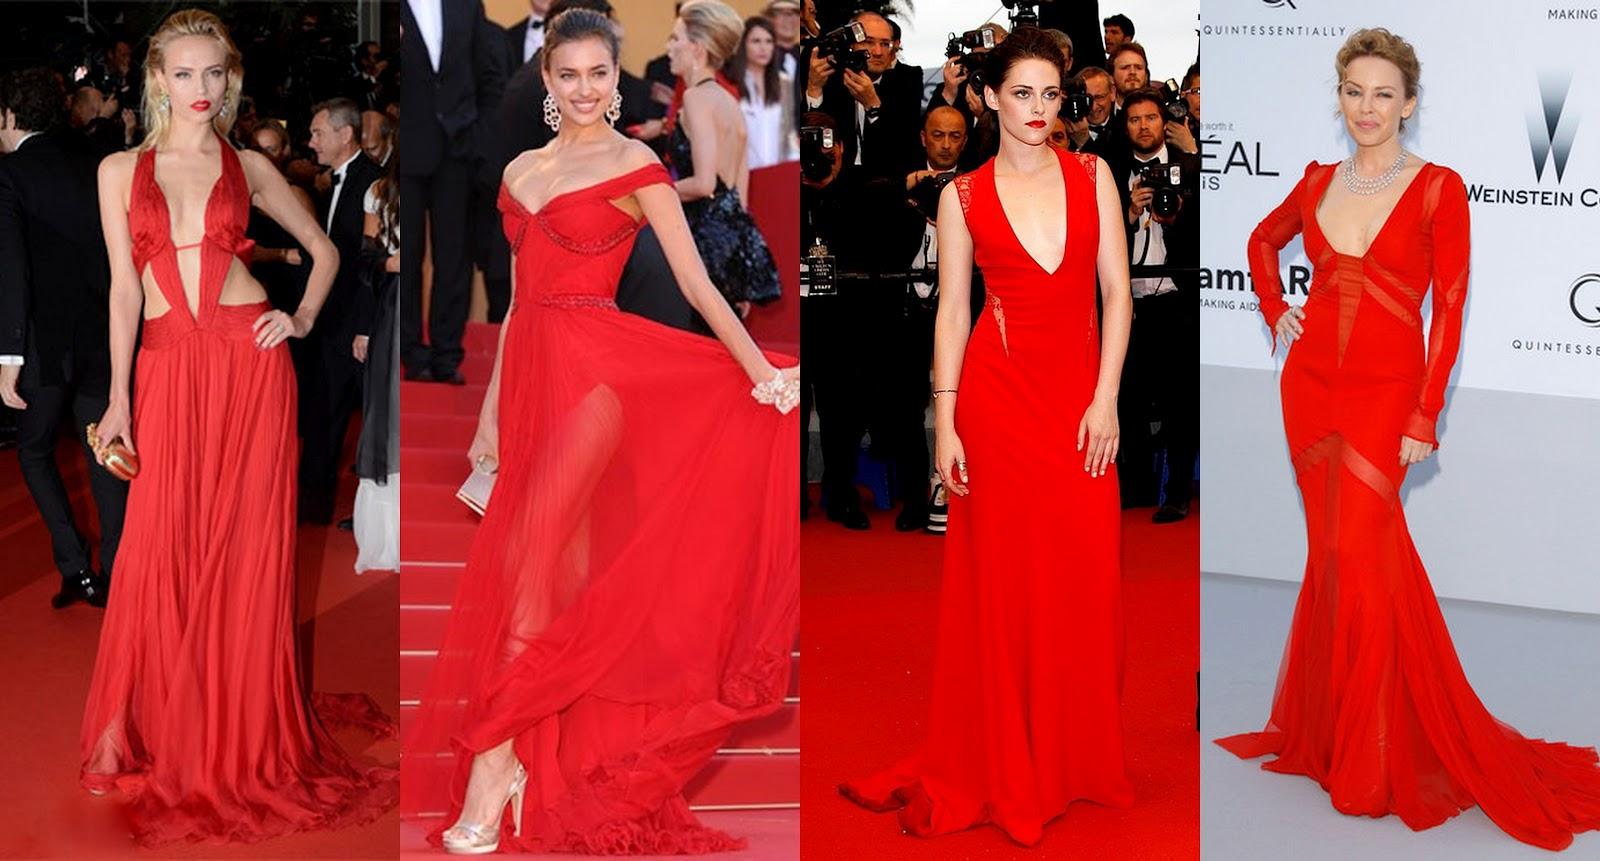 Frills and Thrills: Cannes Film Festival 2012 - Part Three